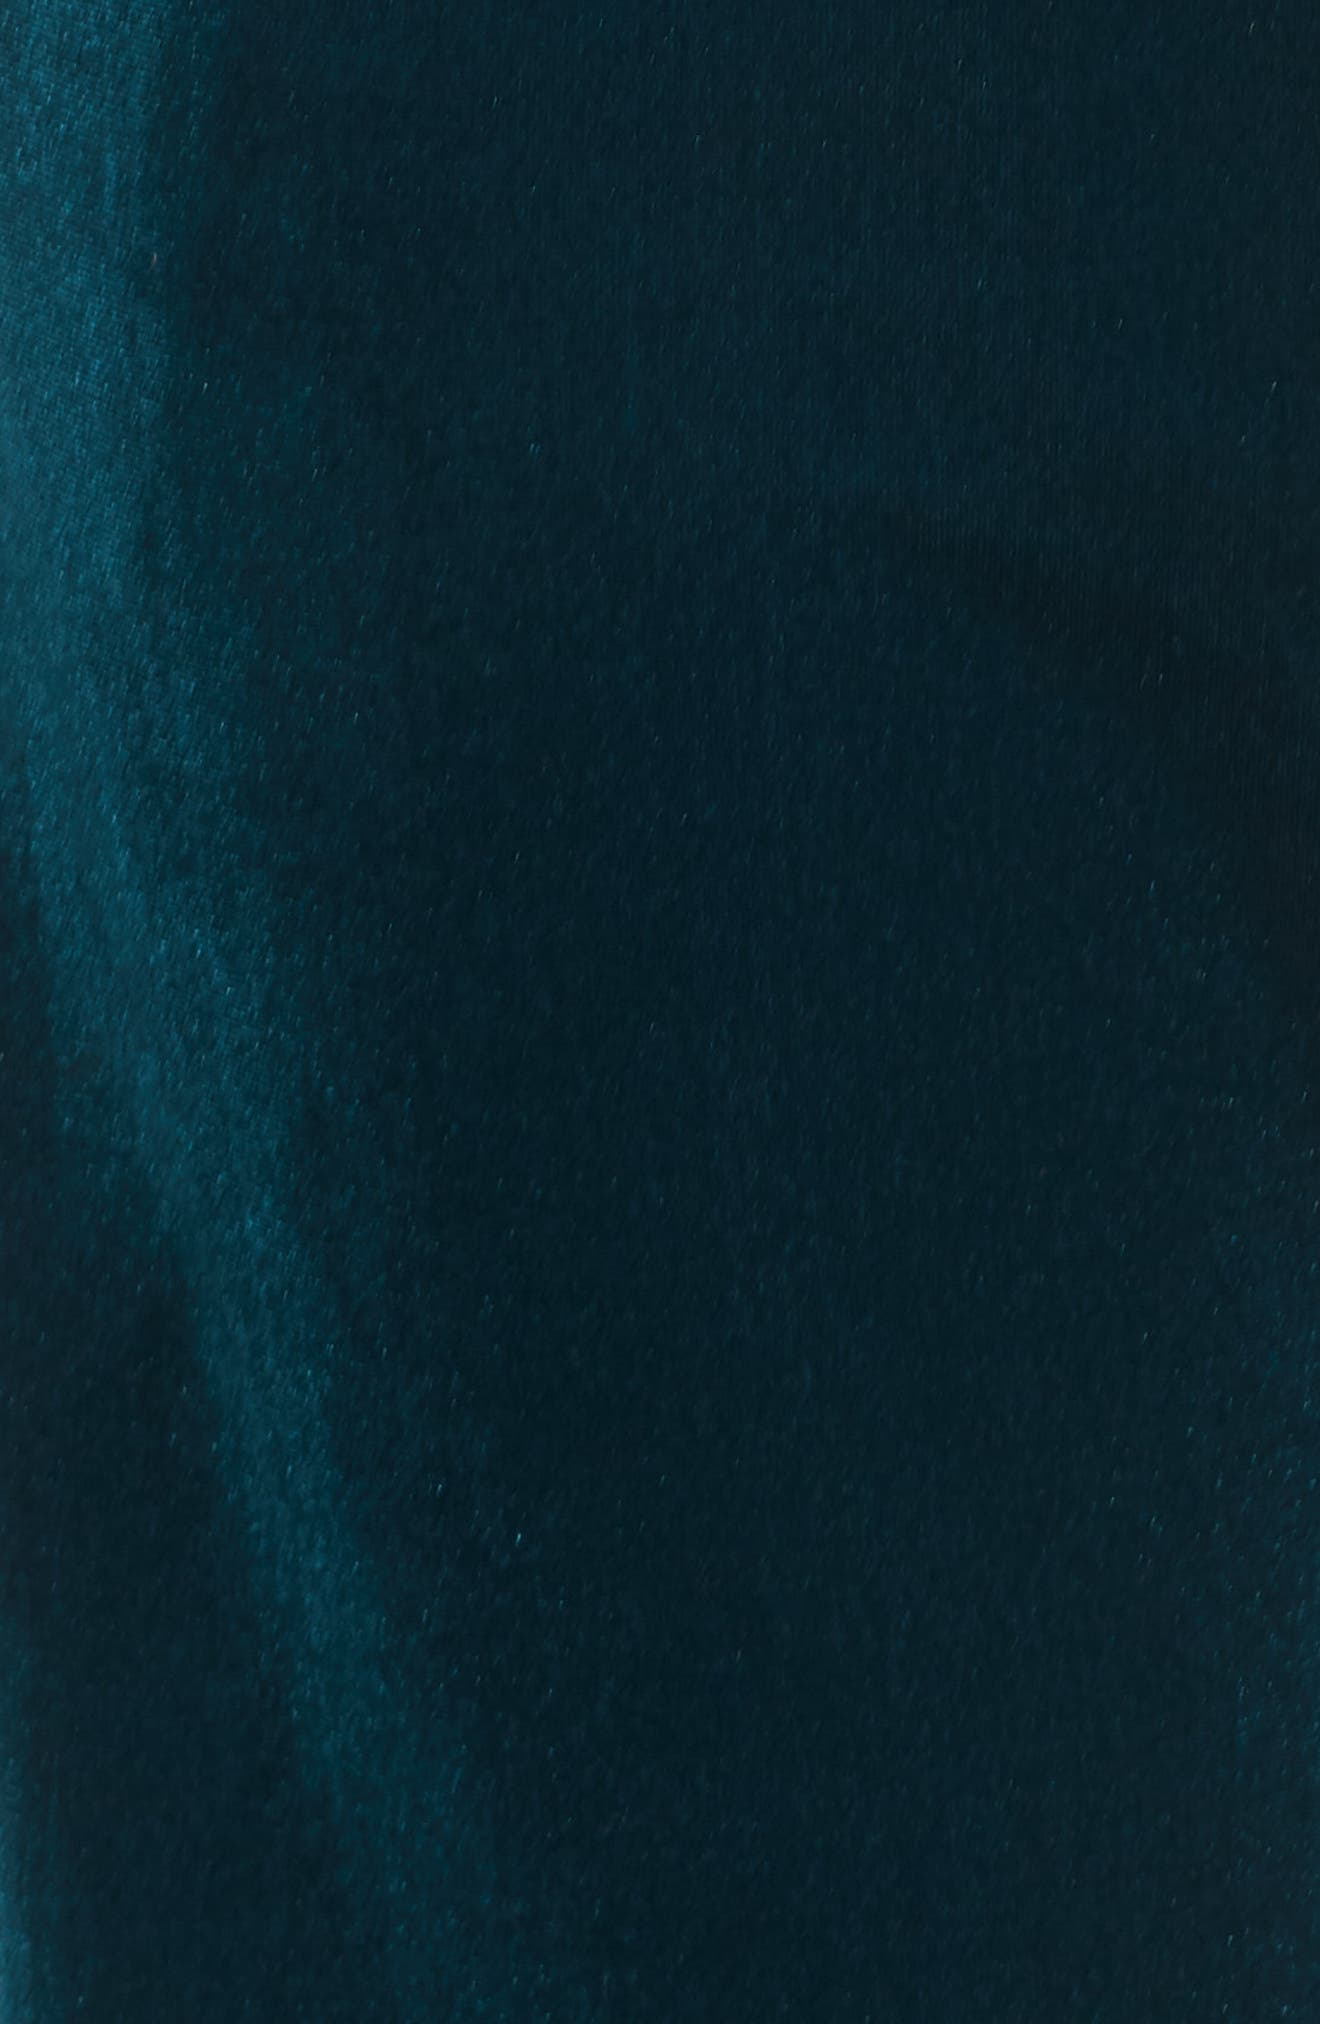 Classic Velvet Sweatpants,                             Alternate thumbnail 6, color,                             TEAL/ RAINBOW